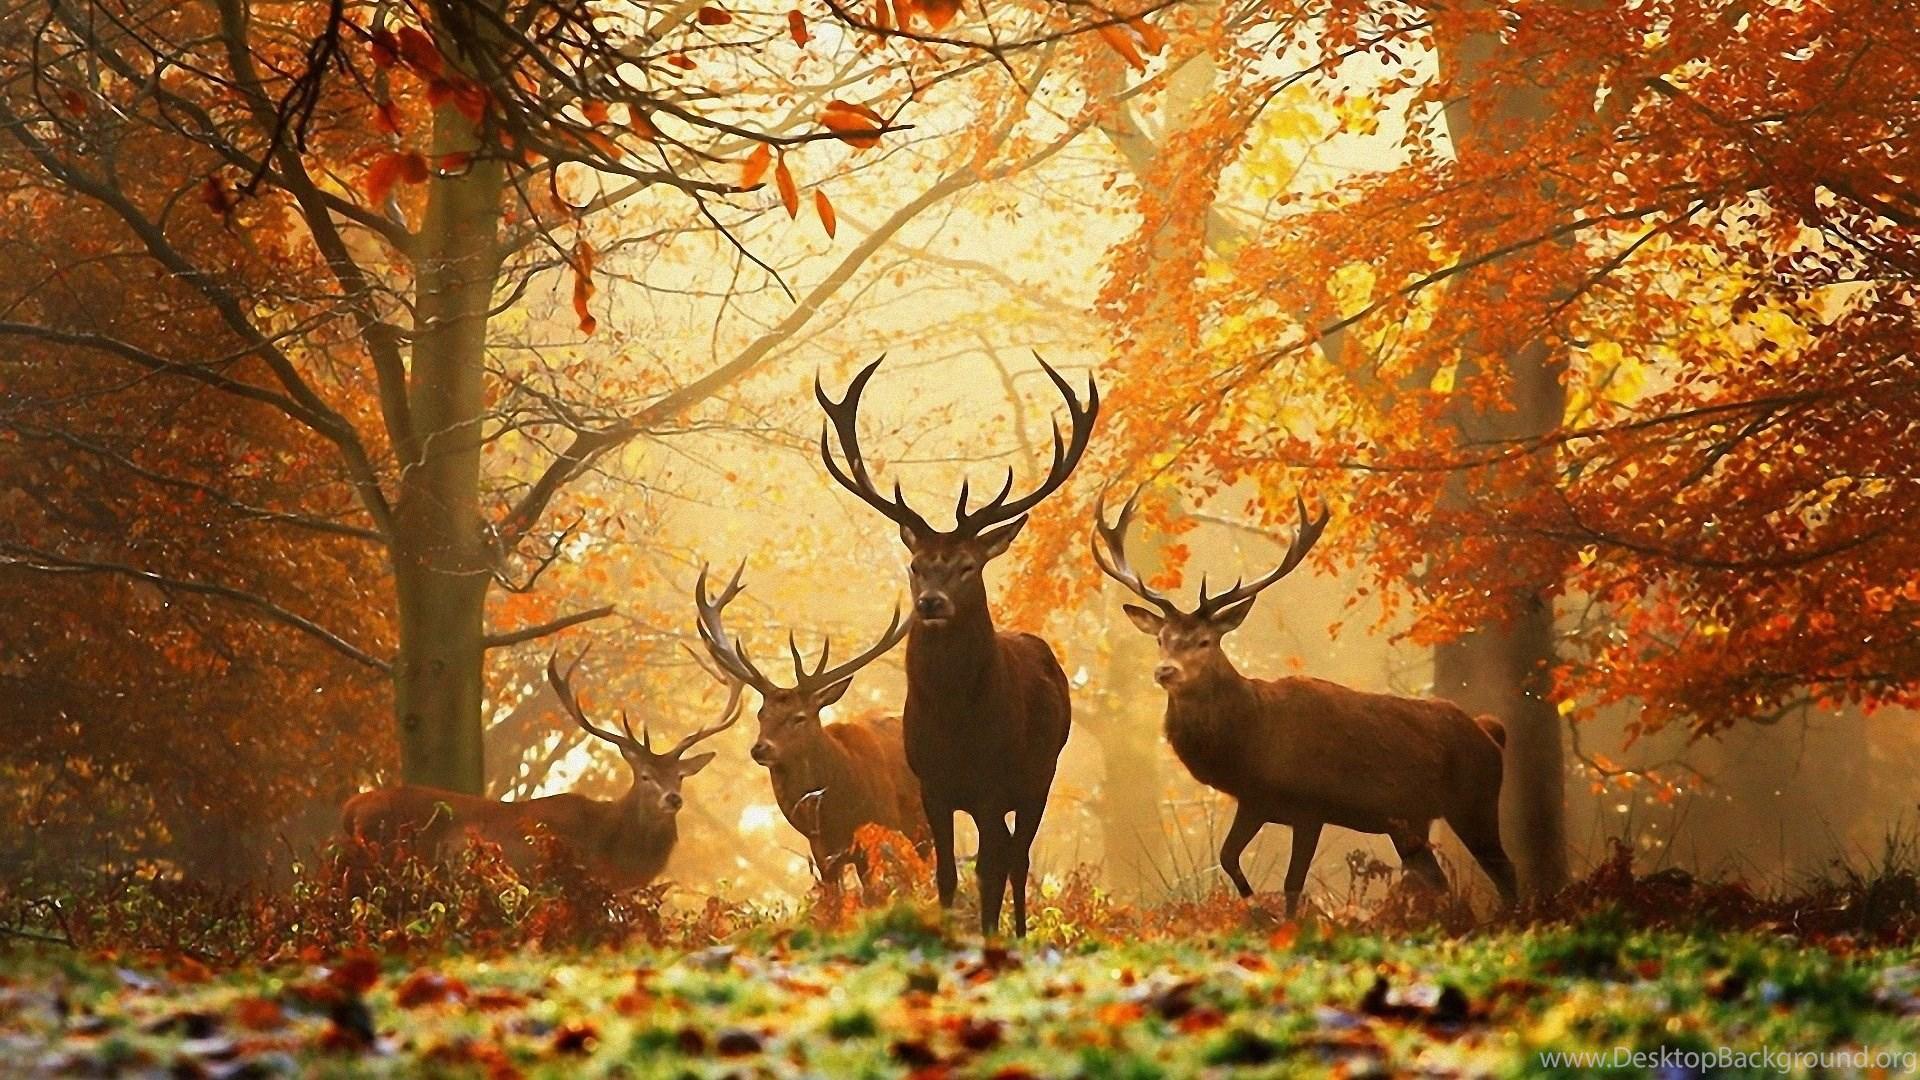 Autumn Hd Desktop Wallpapers Desktop Background